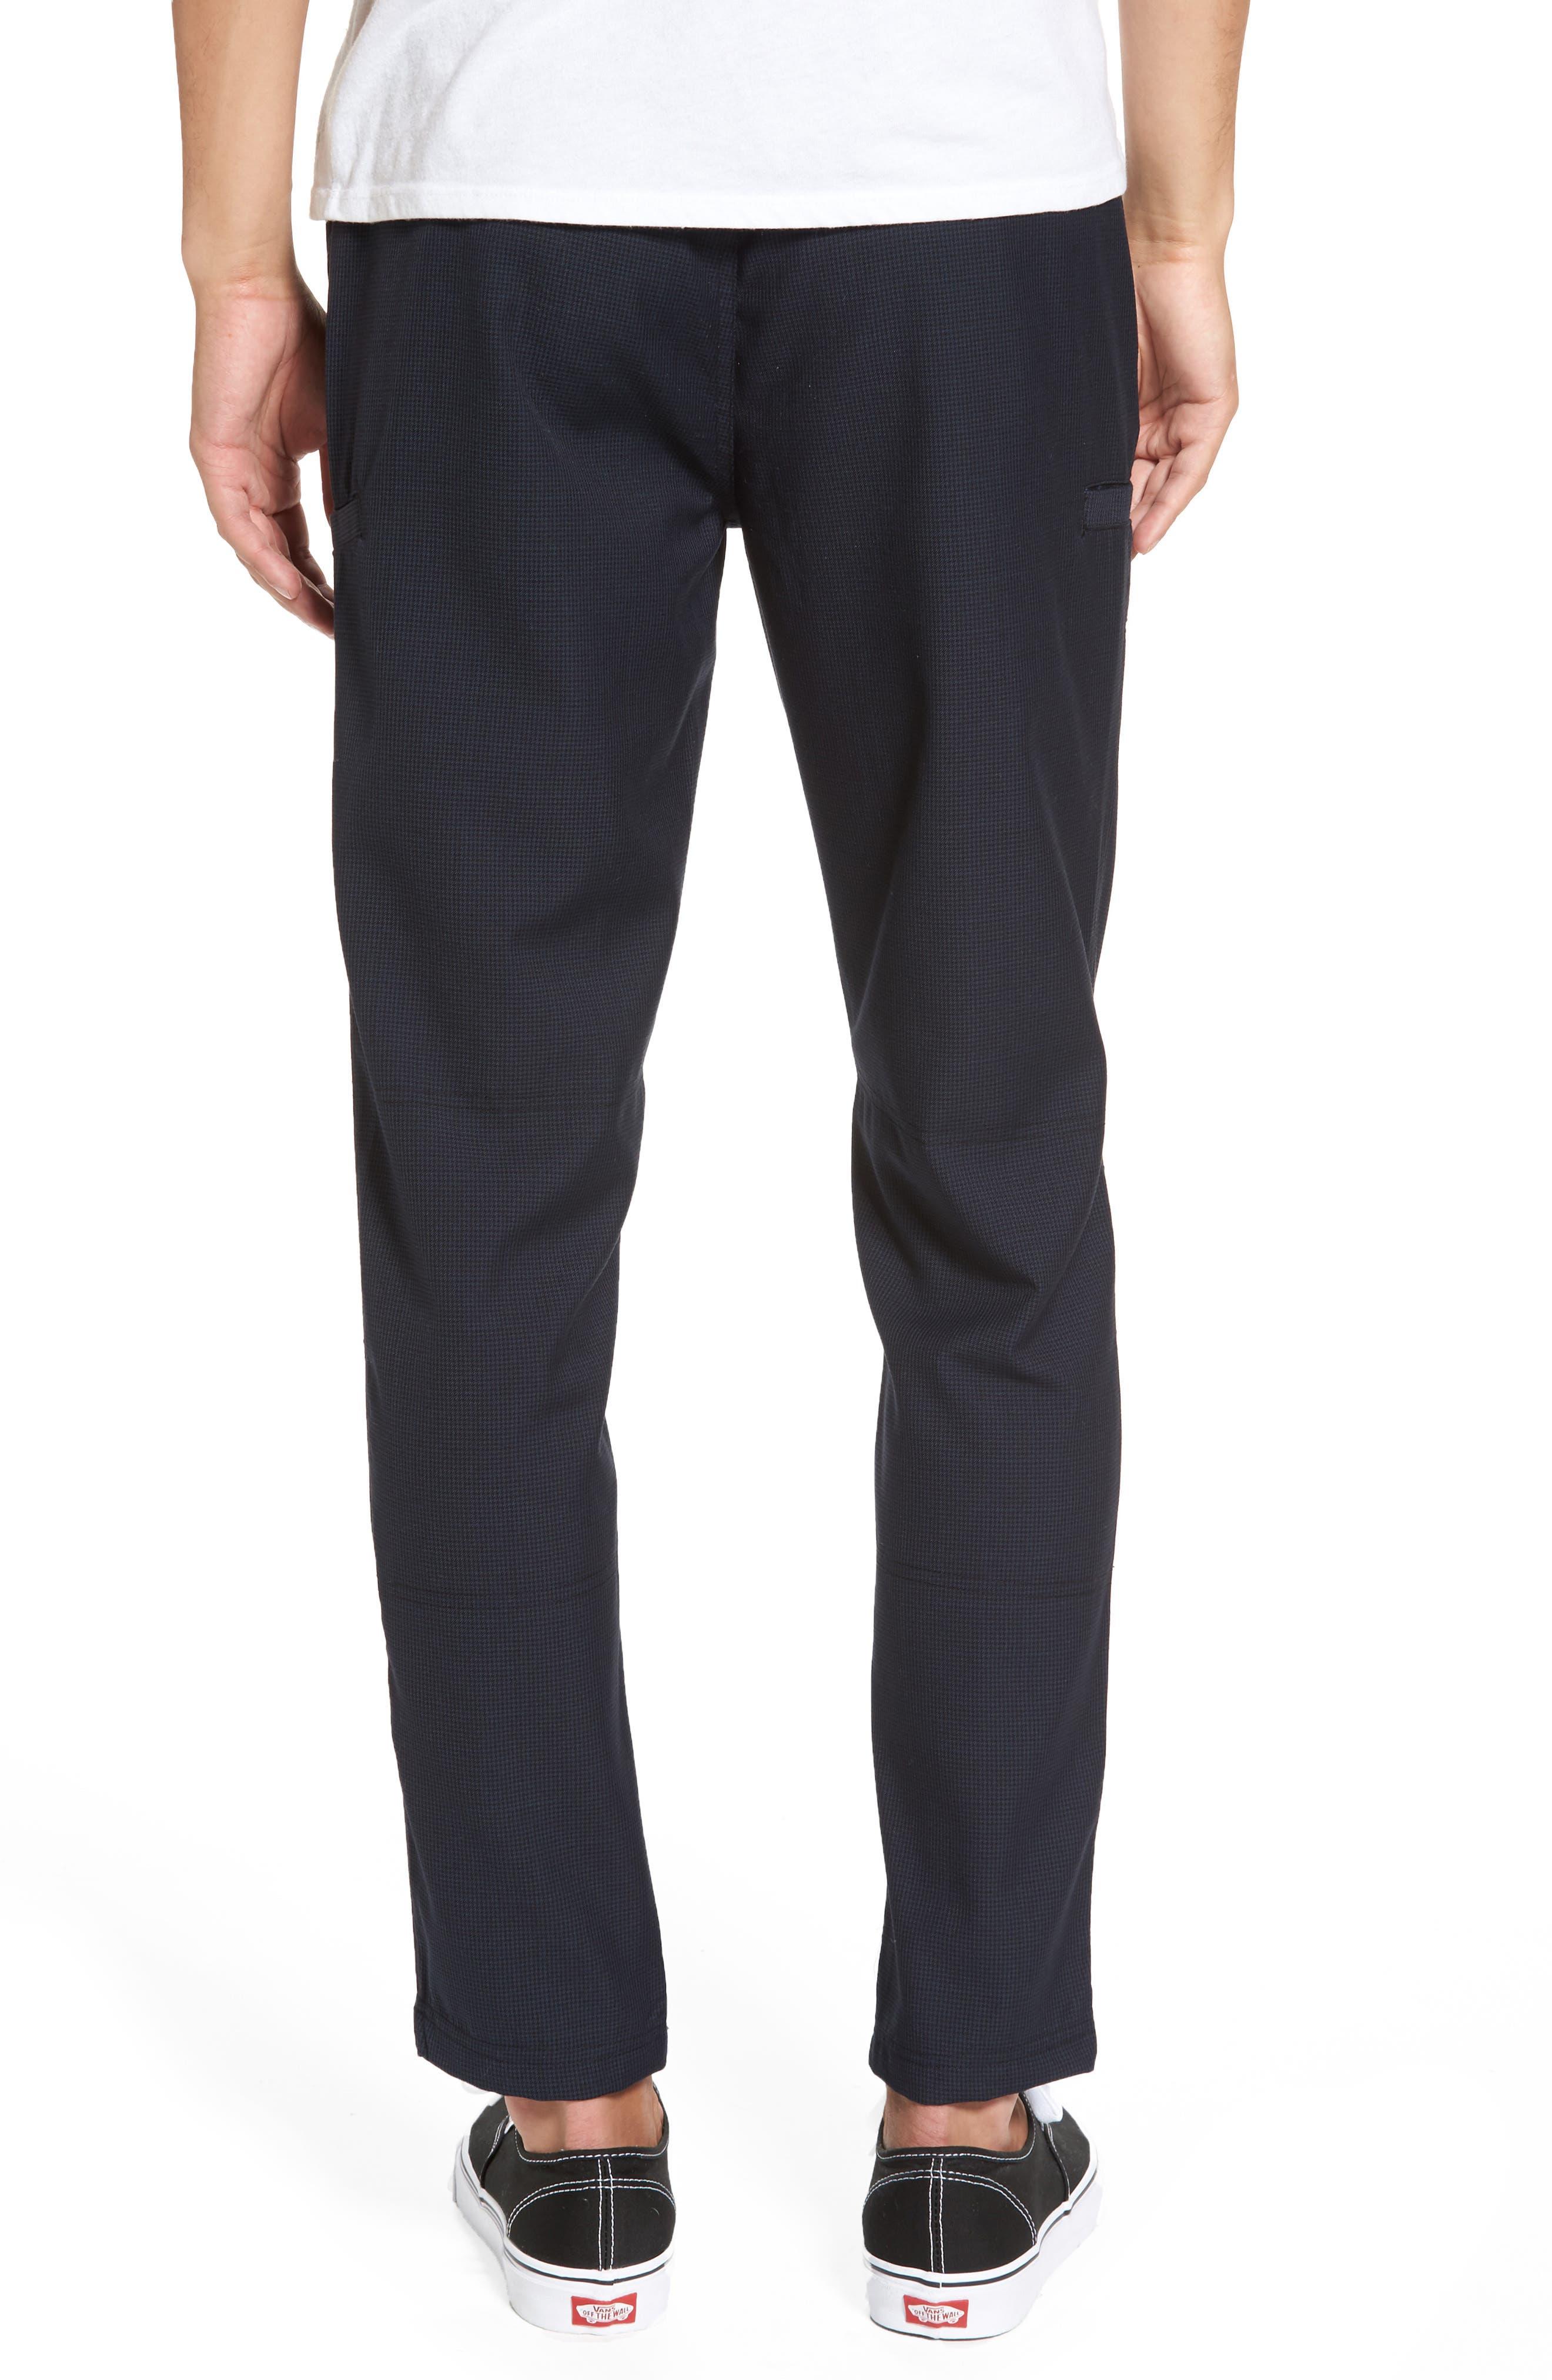 Haycroft Trousers,                             Alternate thumbnail 2, color,                             Navy